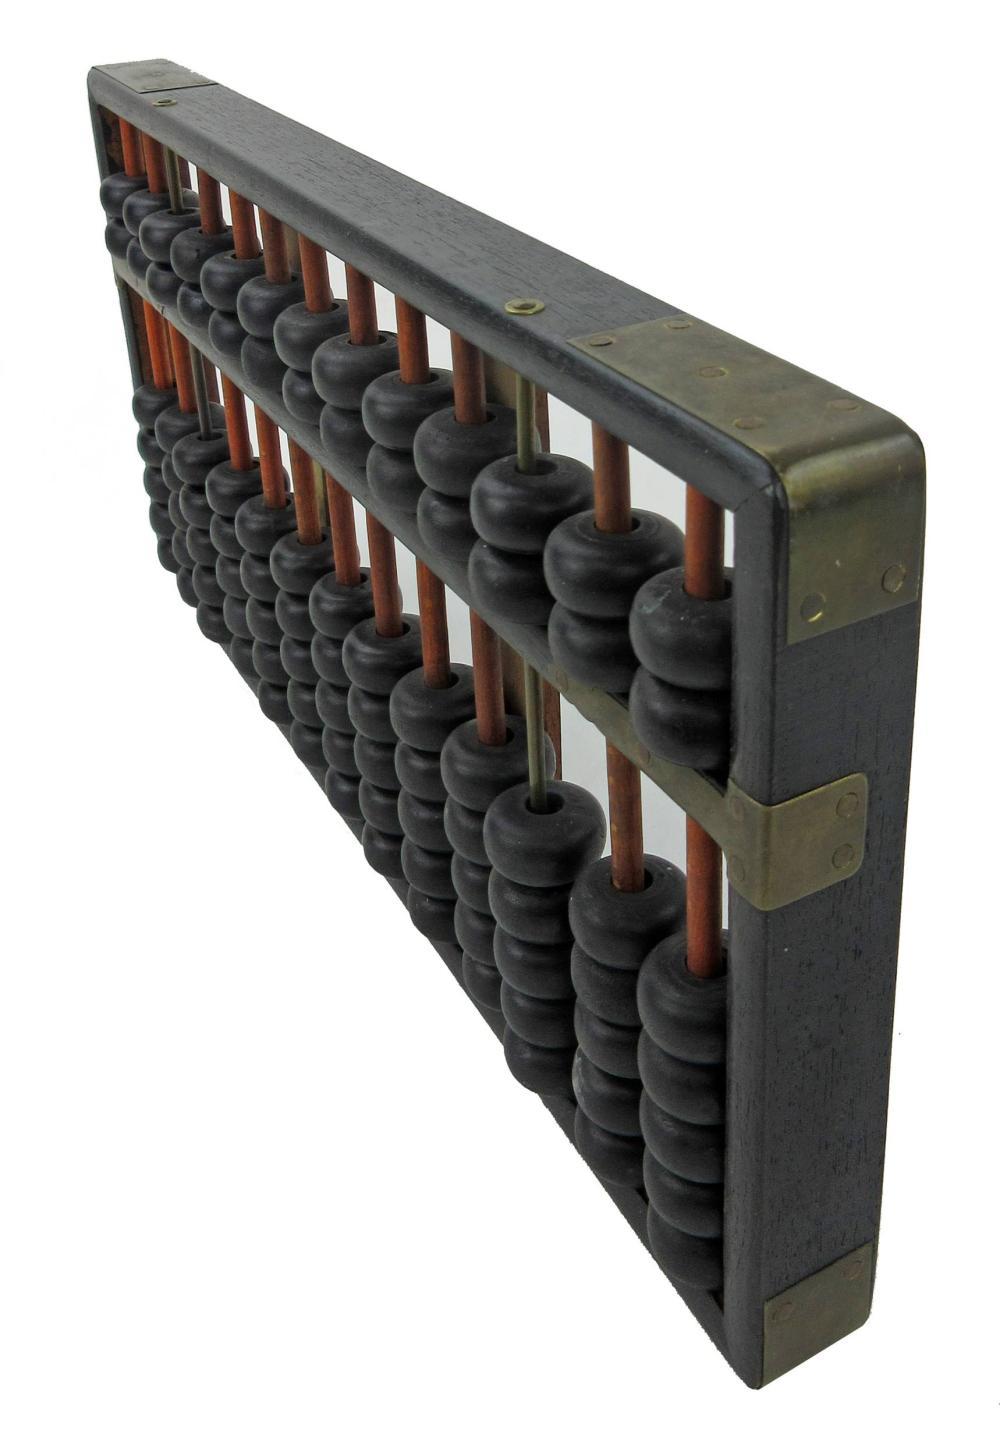 Jack Kerouac's Personally Owned & Used Hong Kong Export Abacus, Estate-Certified